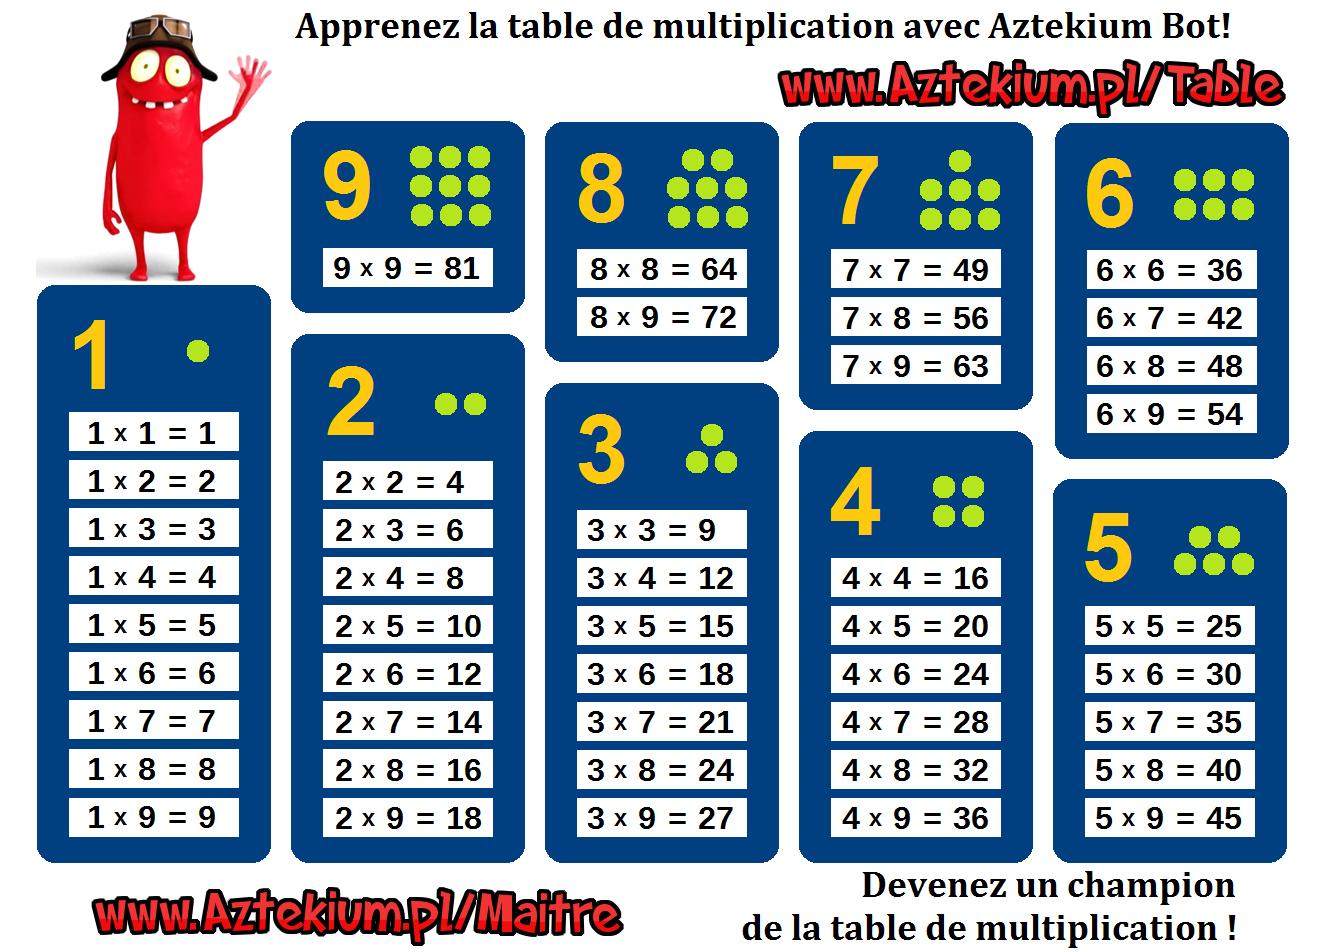 Table De Multiplication À Imprimer Jusqu'a 20 encequiconcerne Tables Multiplication À Imprimer